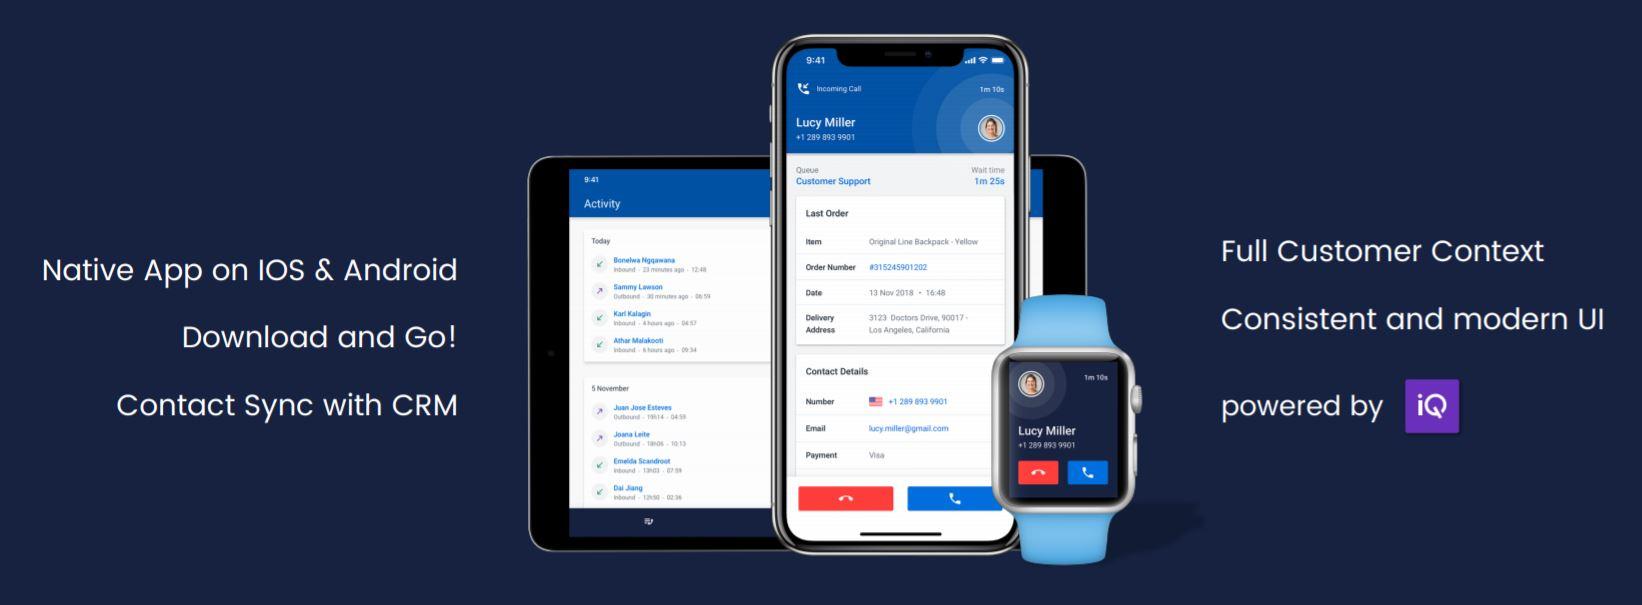 Talkdesk Mobile App